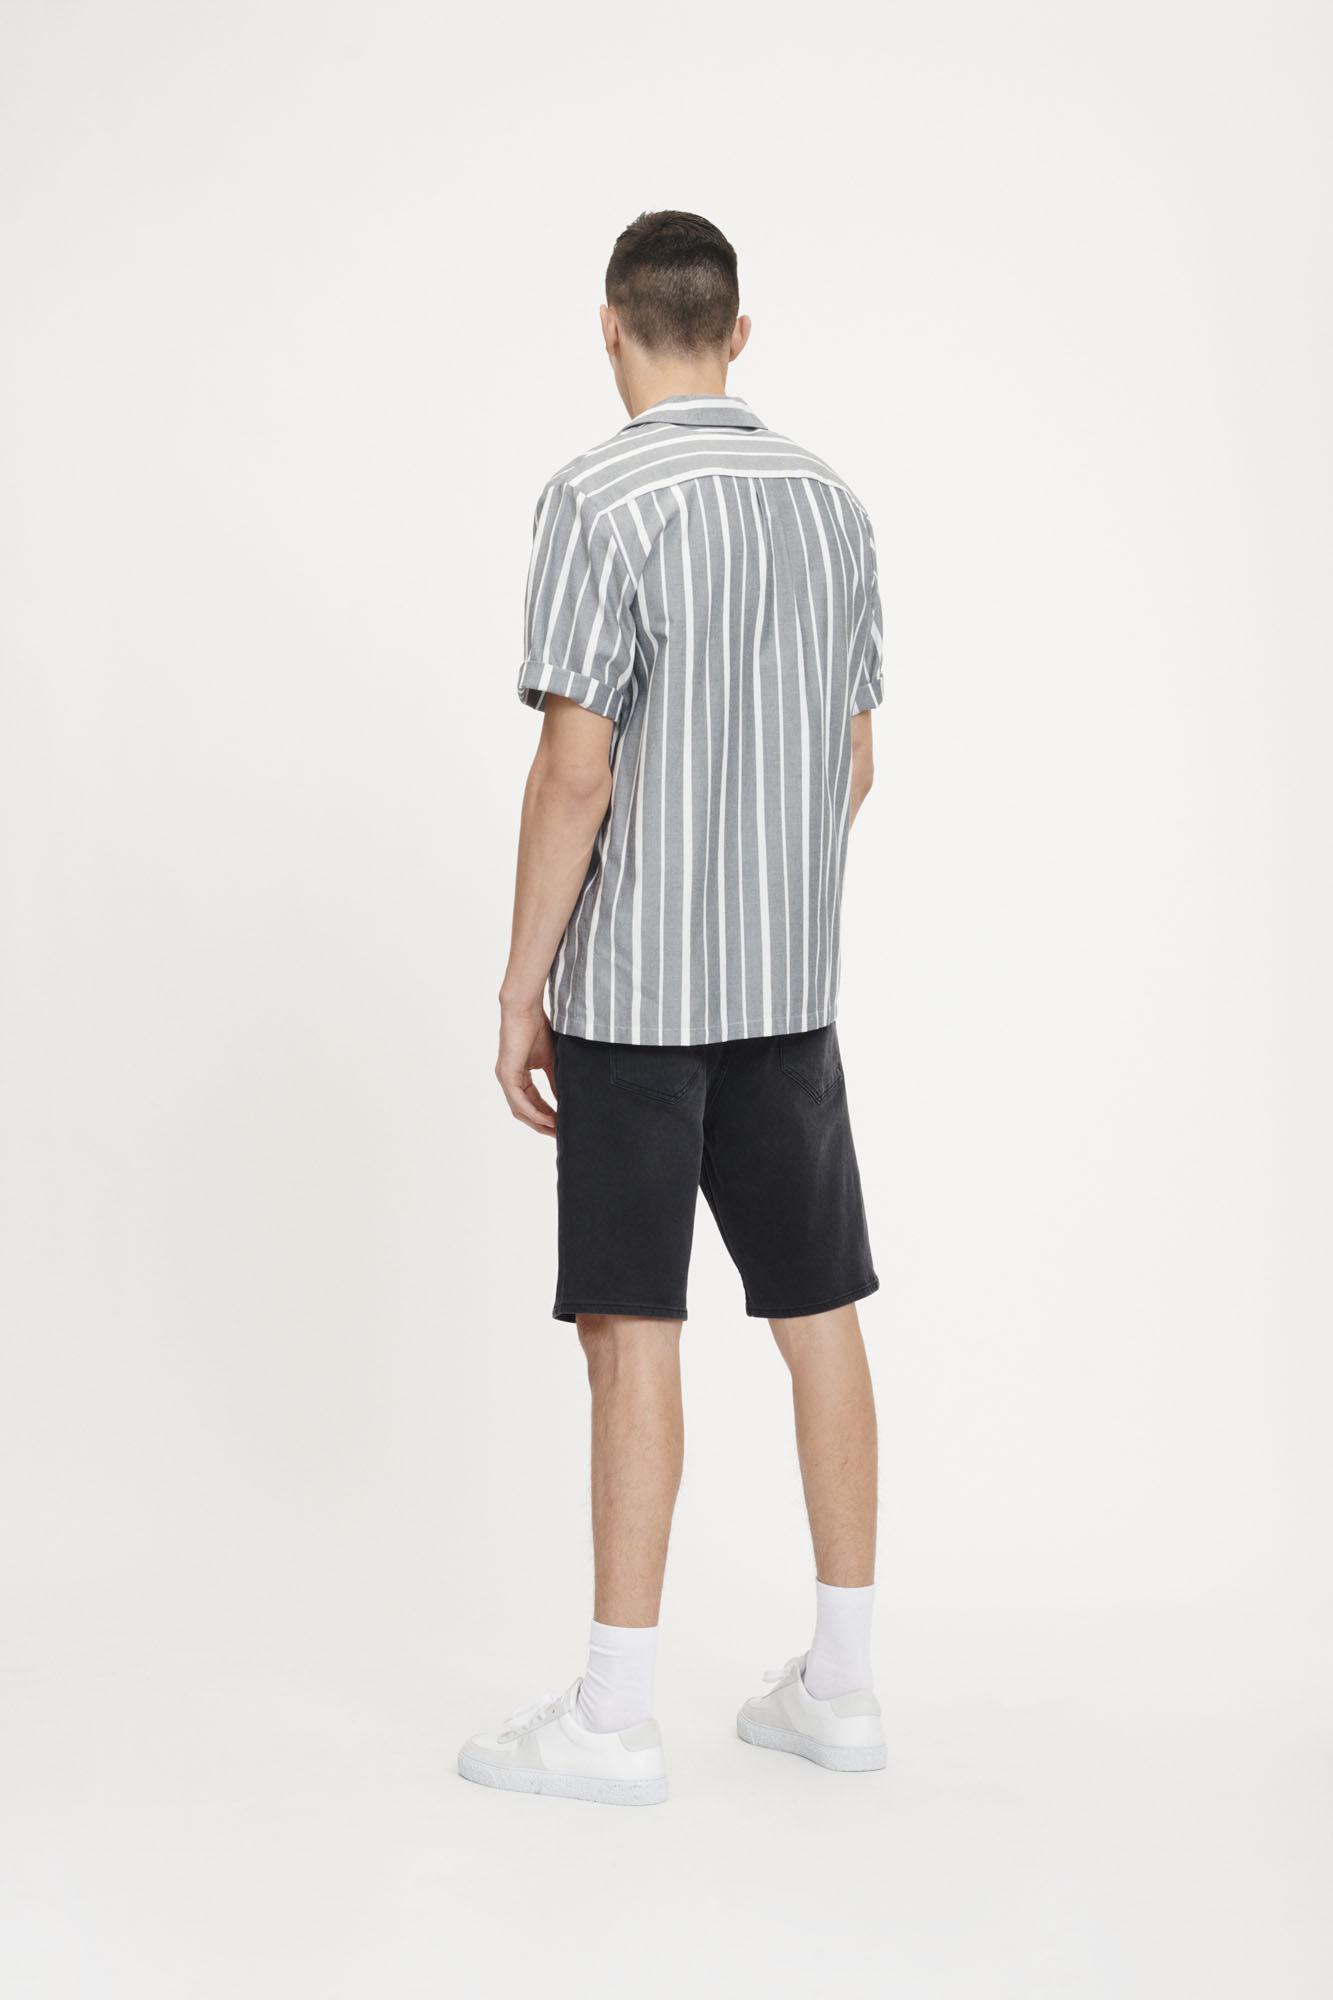 Oscar AX shirt 10923